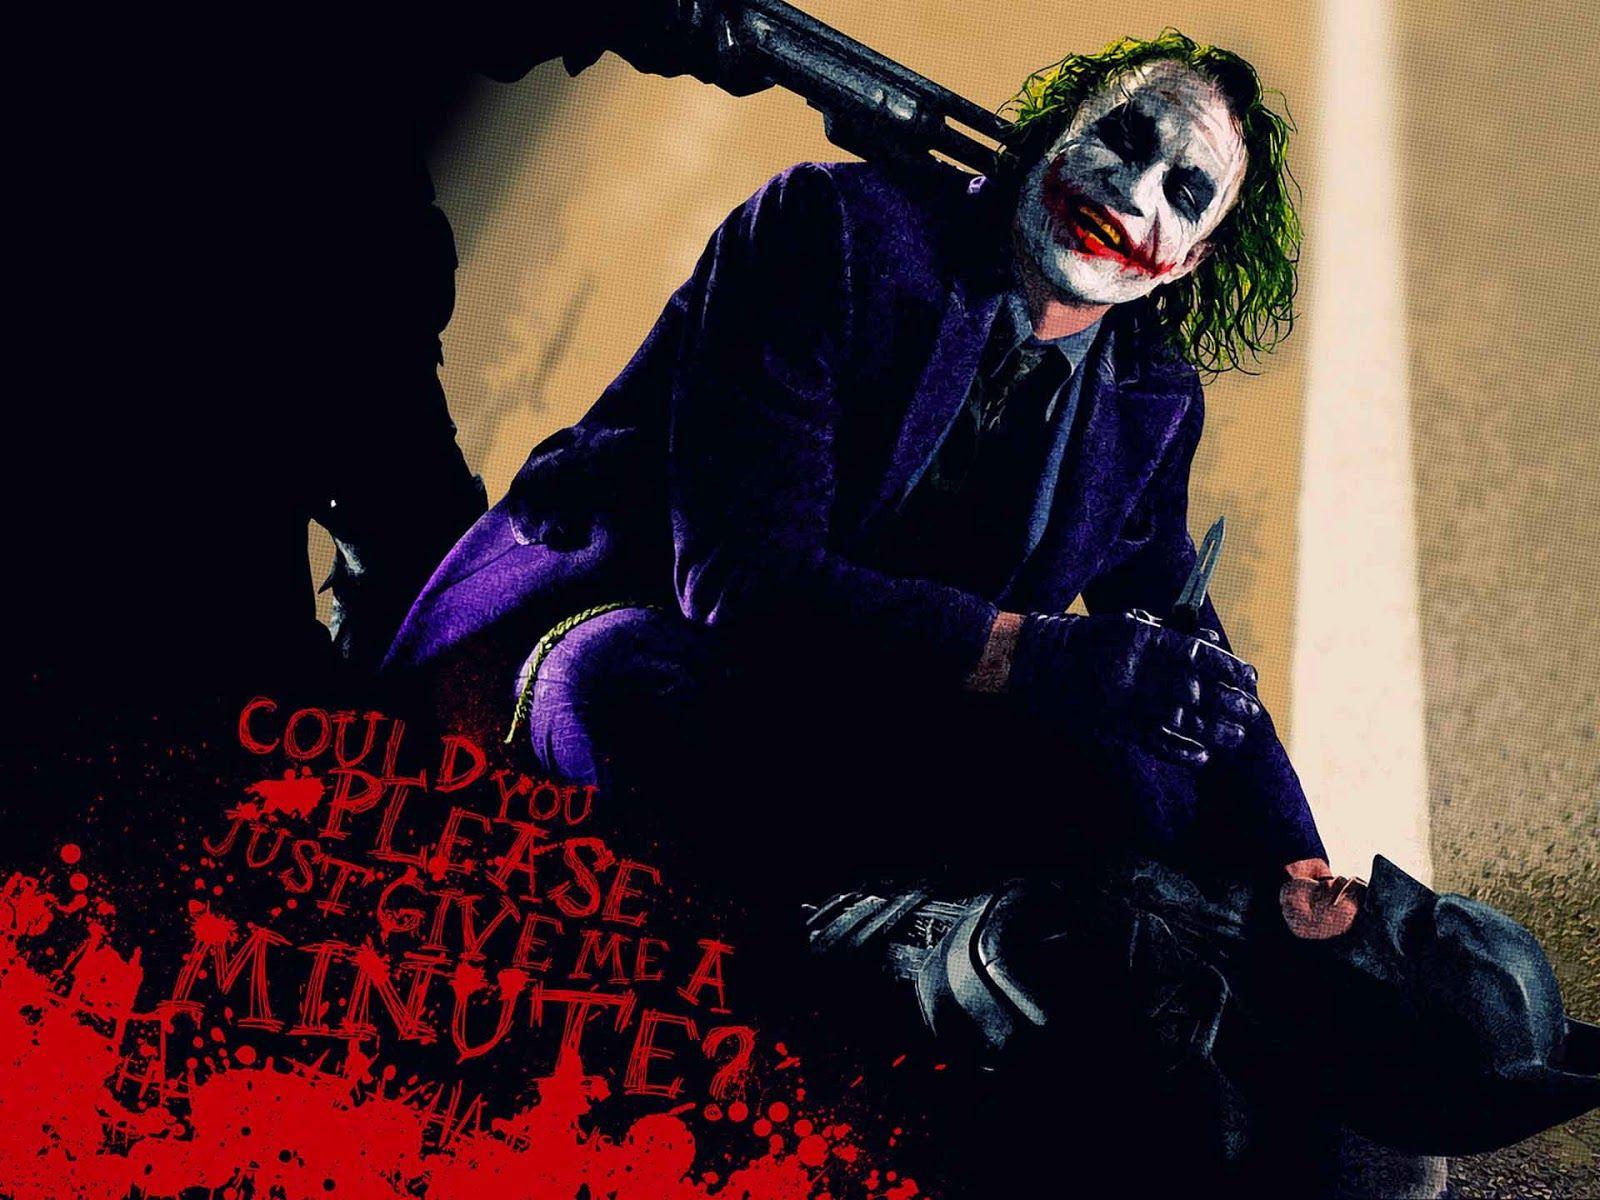 Wallpaper download joker - Pic New Posts Joker Hd Wallpaper Download